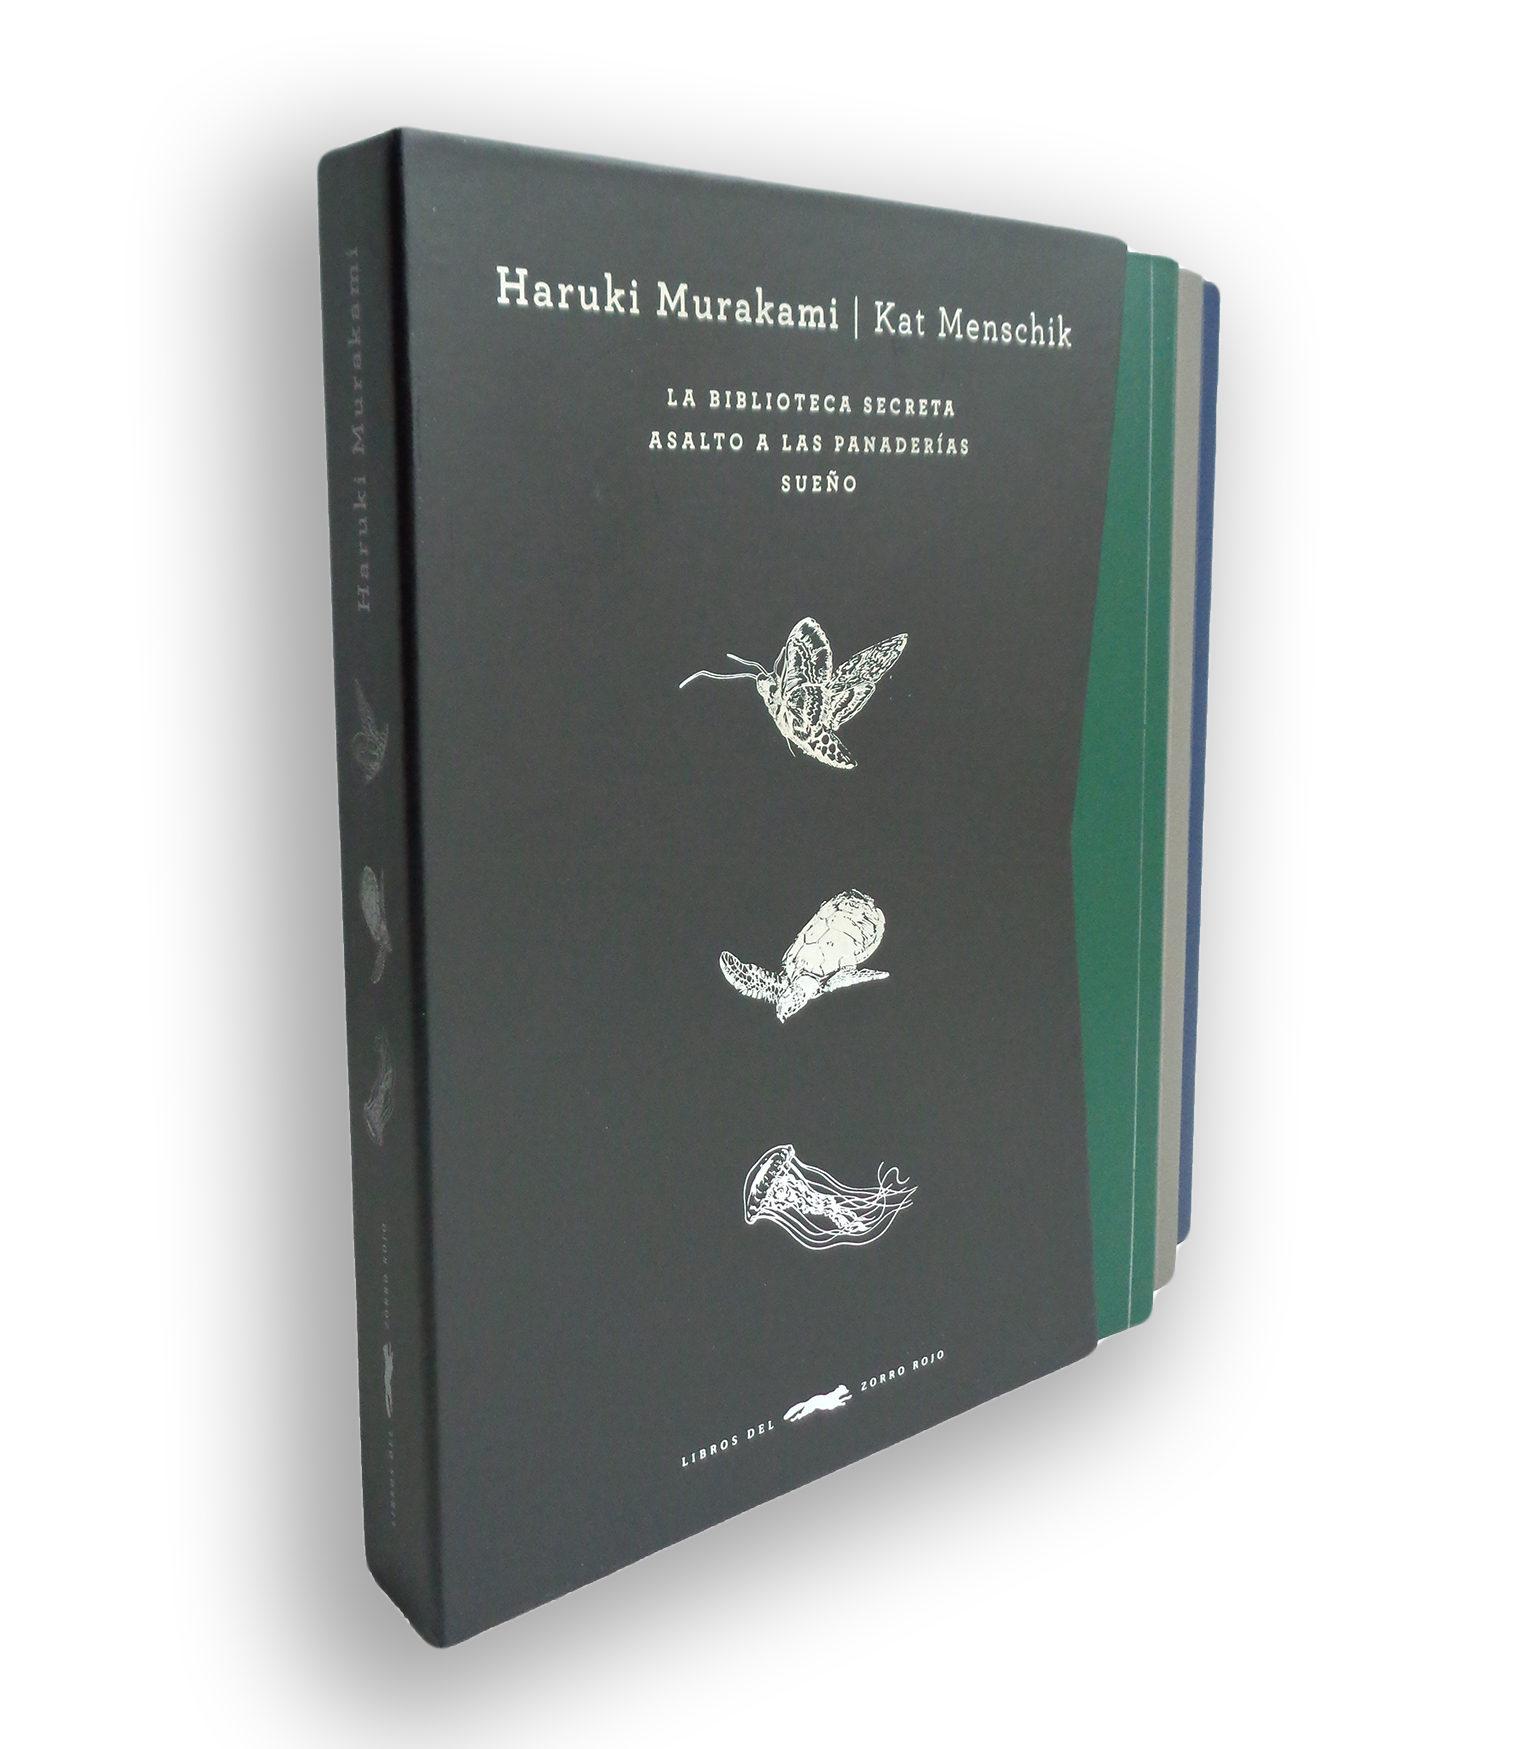 Trilogía Haruki Murakami